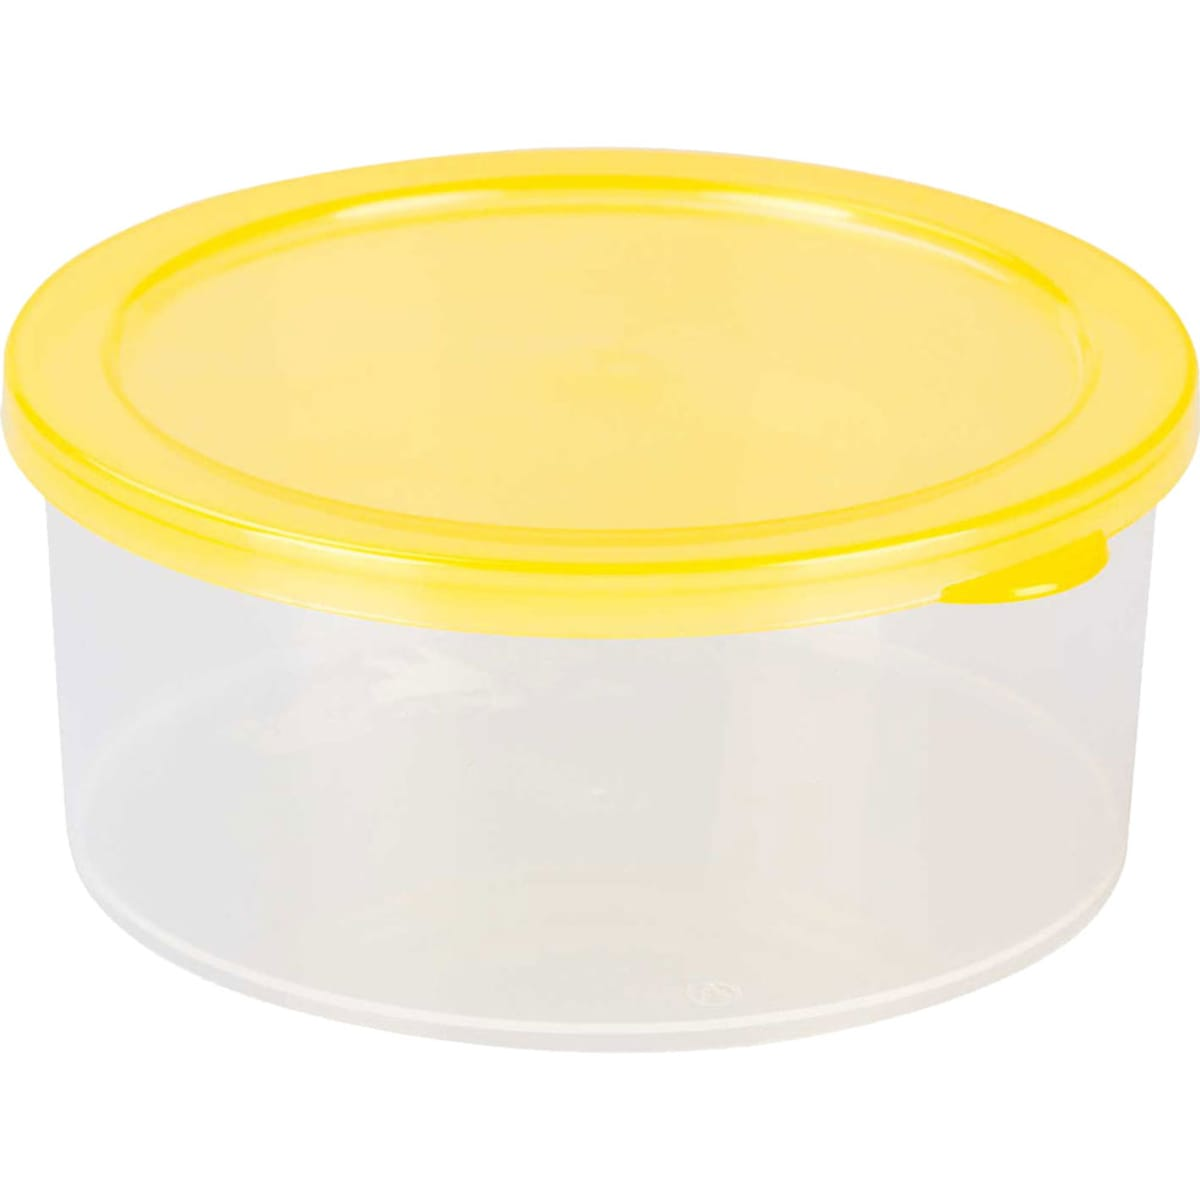 Контейнер для продуктов Альтернатива  0.4 л